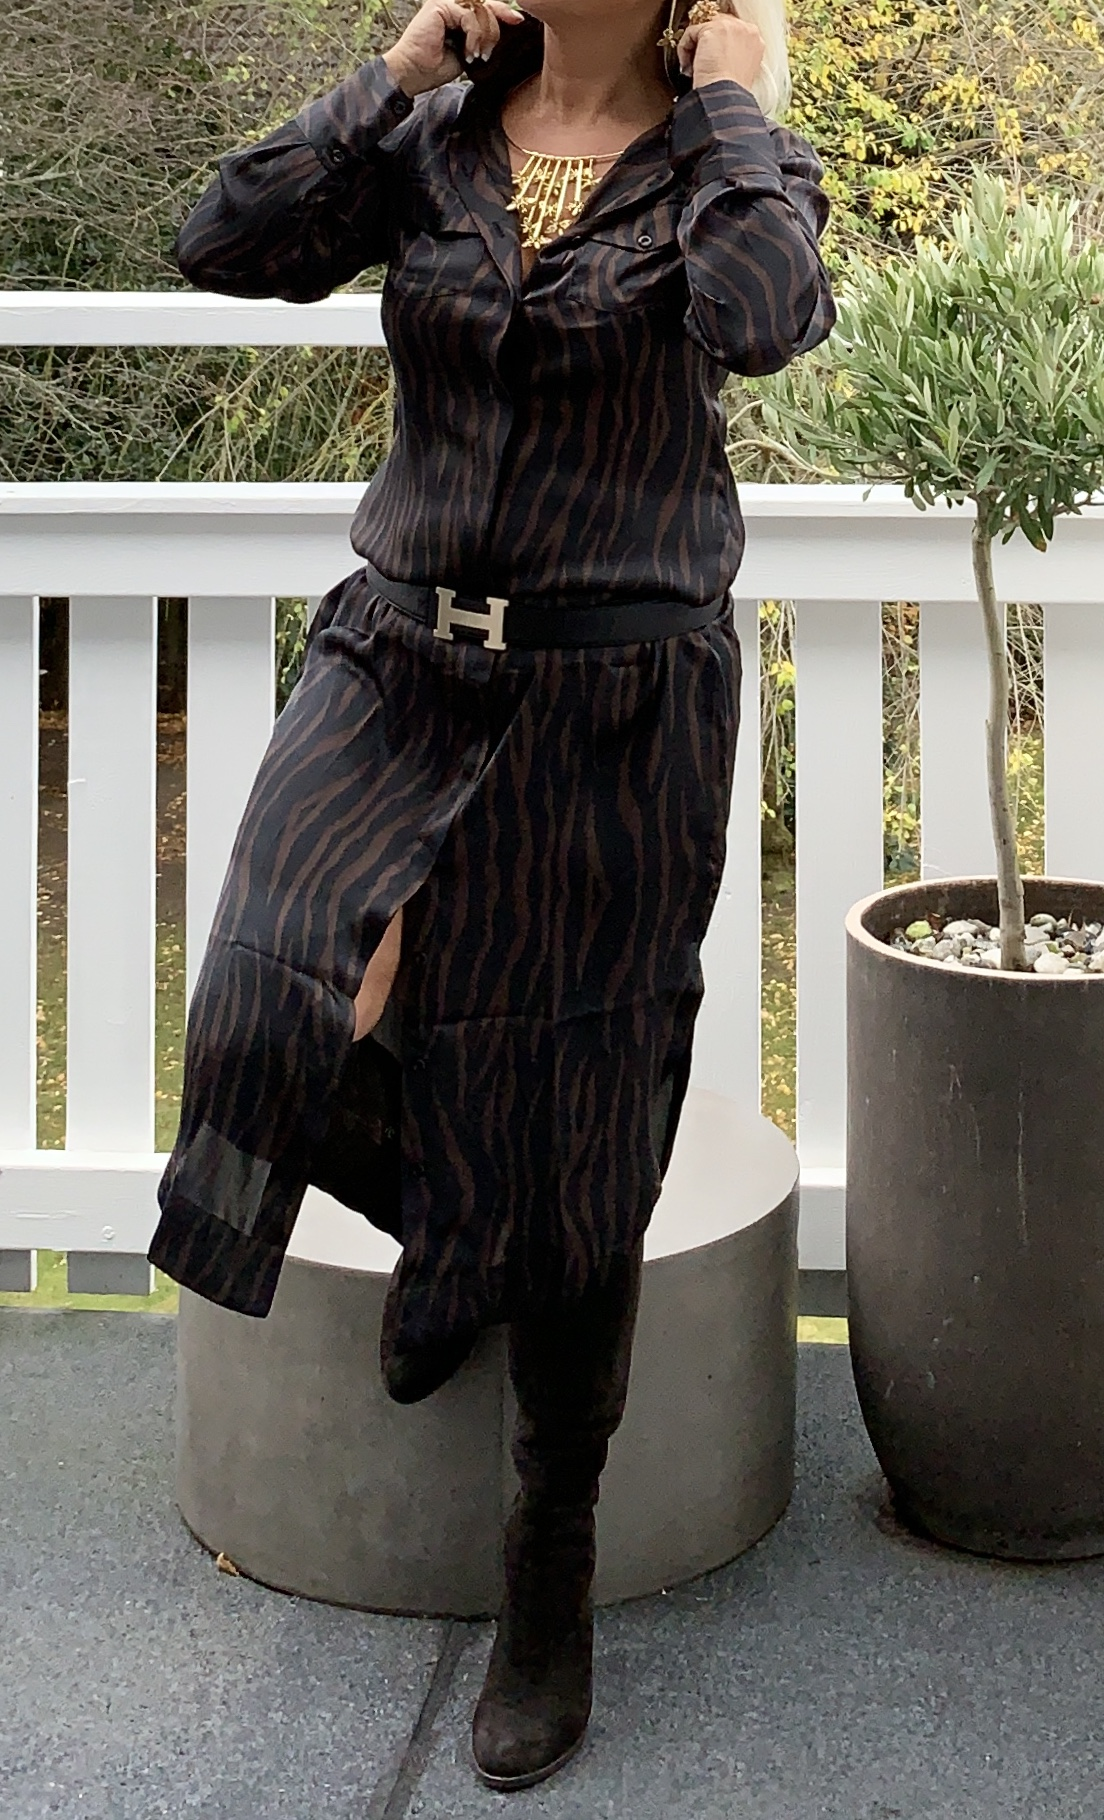 Harper-Dress-Terra-Zebra- image by me